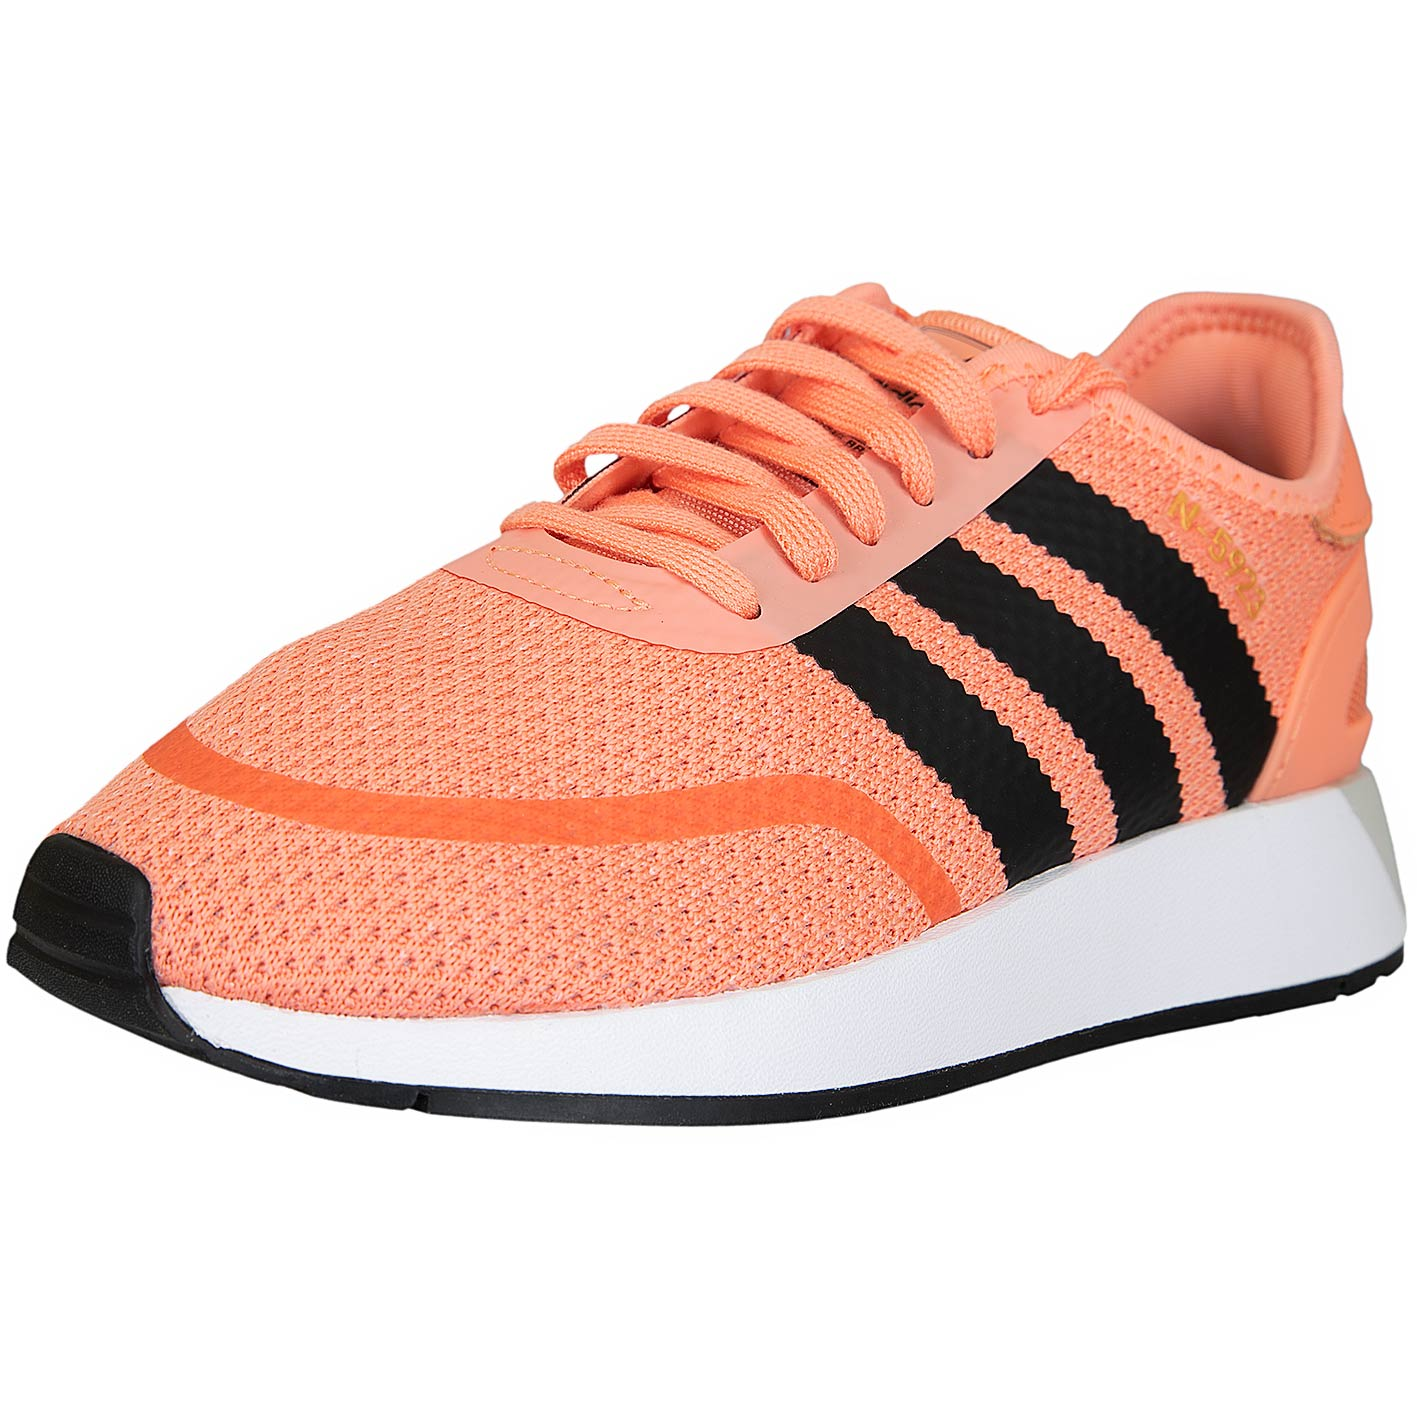 adidas Originals N 5923 Sneaker Damen Lila Rosa